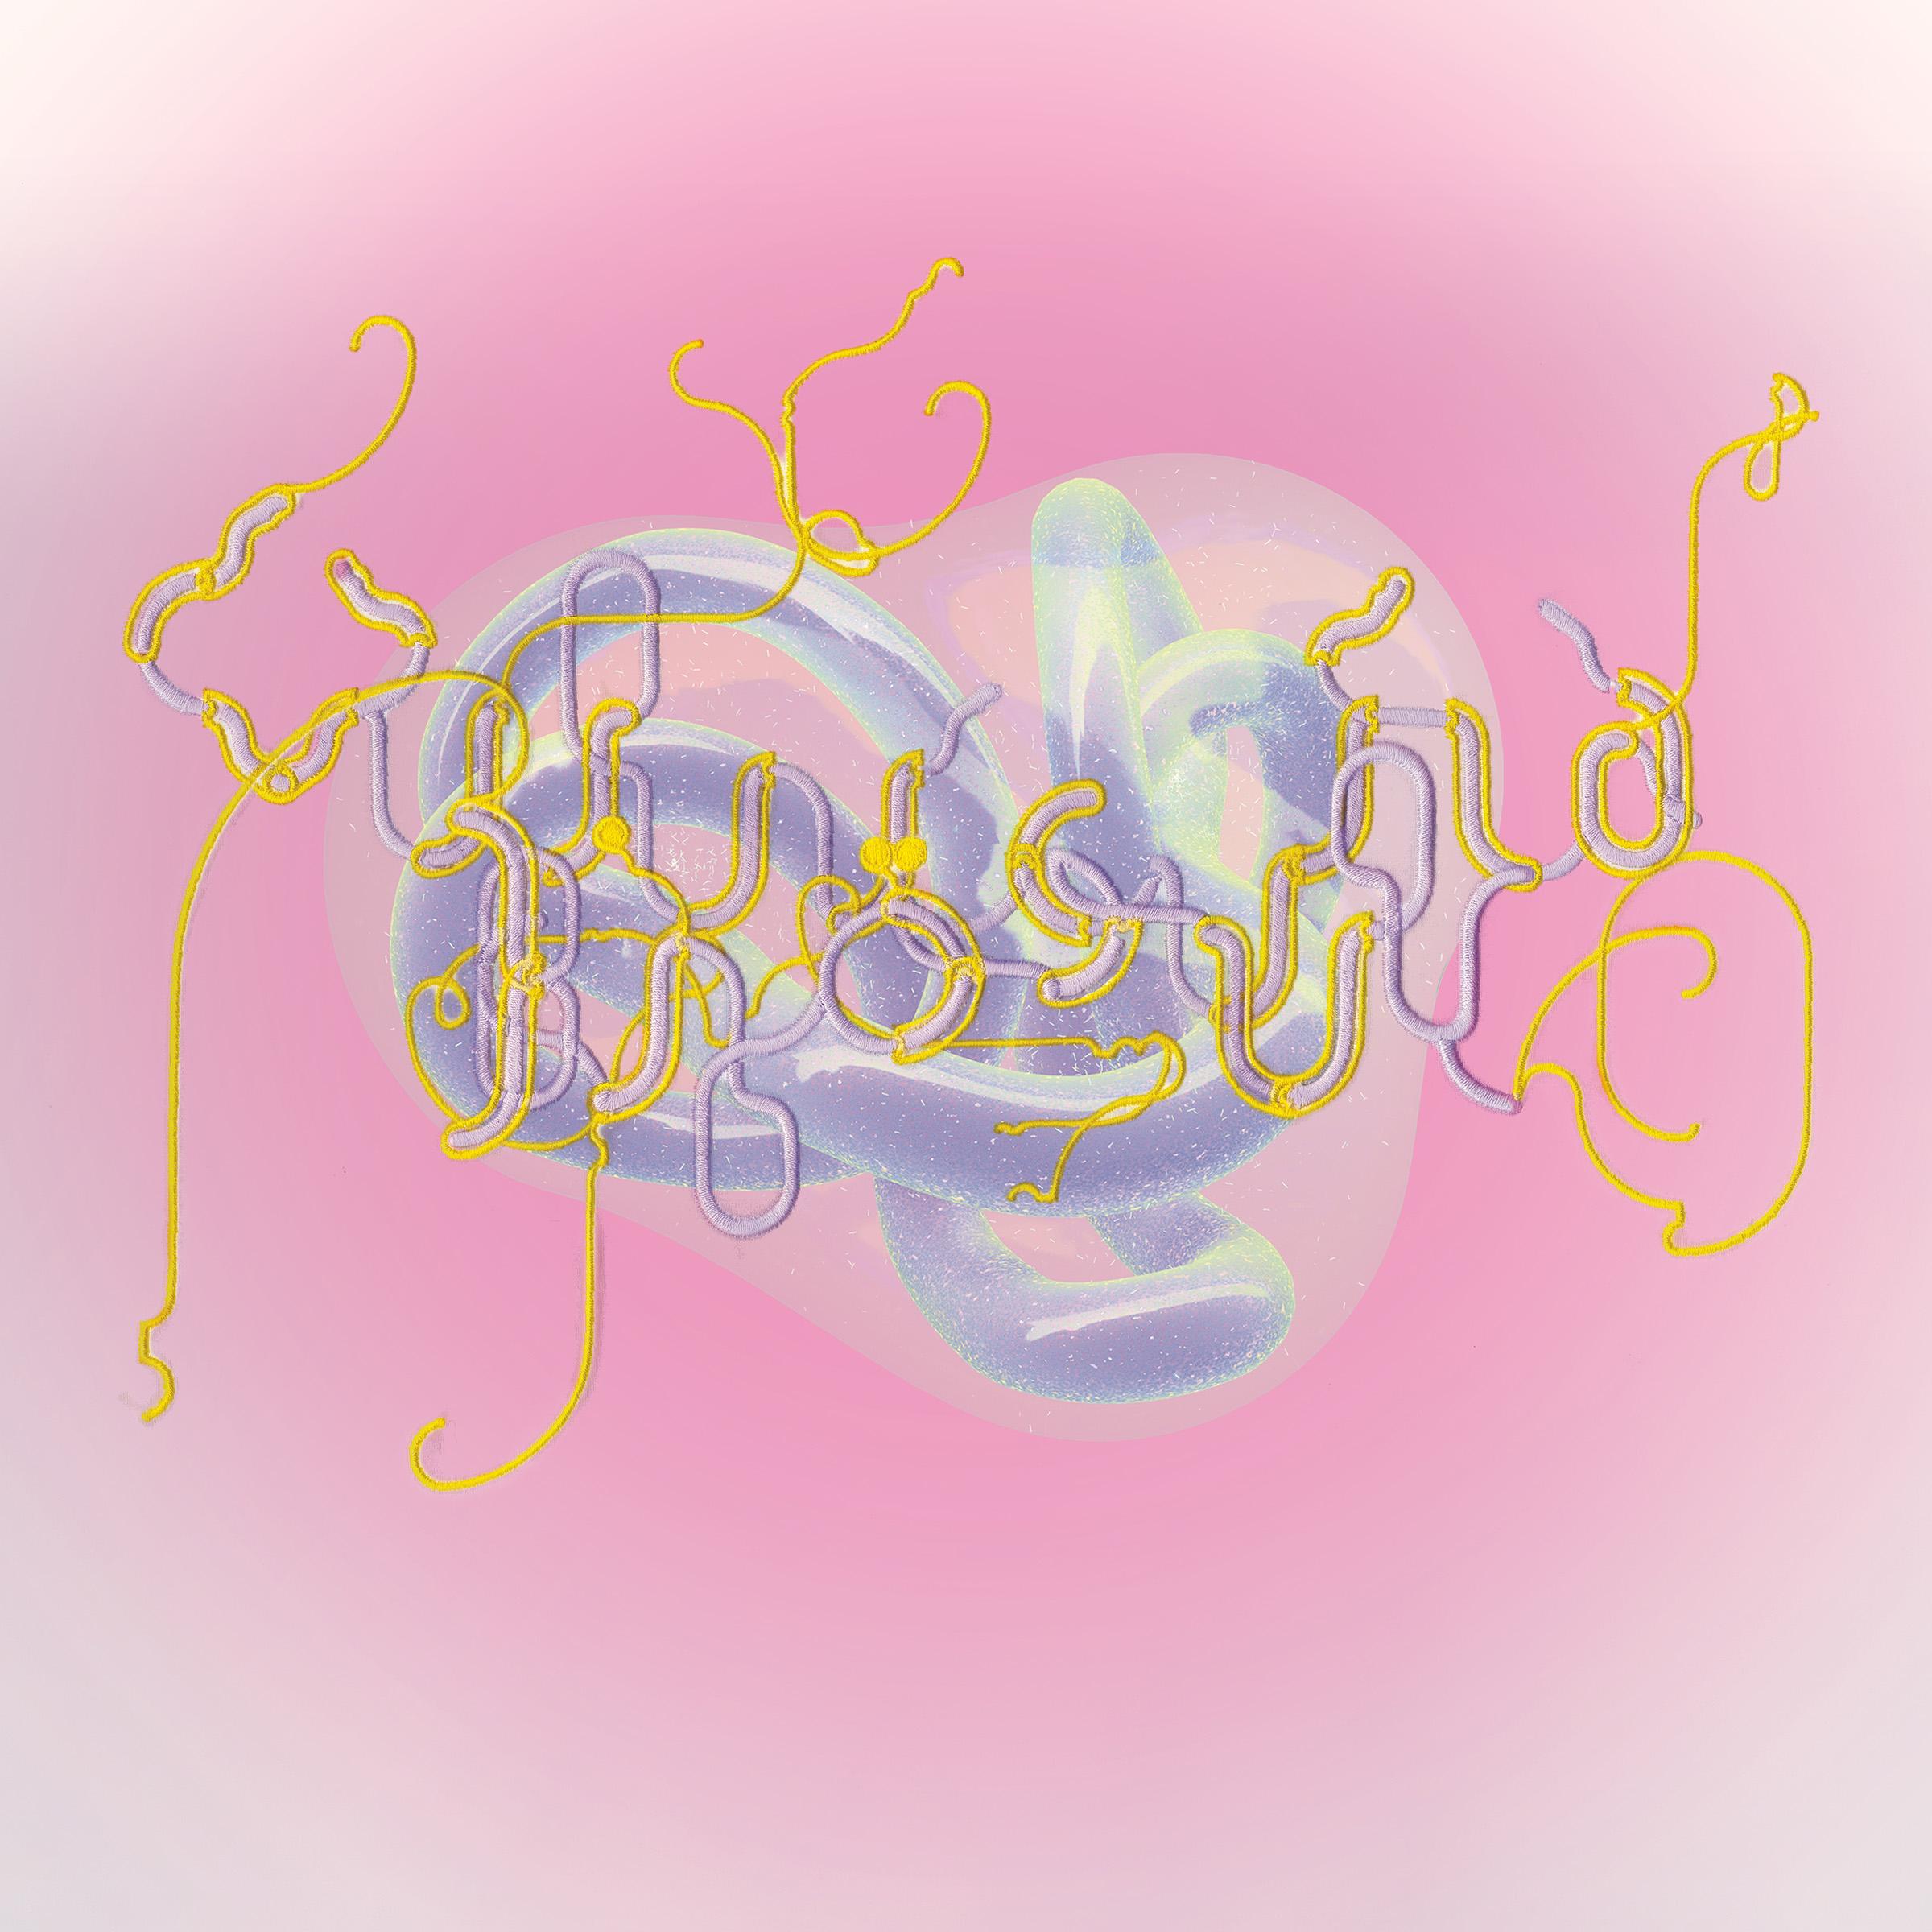 artworks-000119686679-f8joog-original.jp